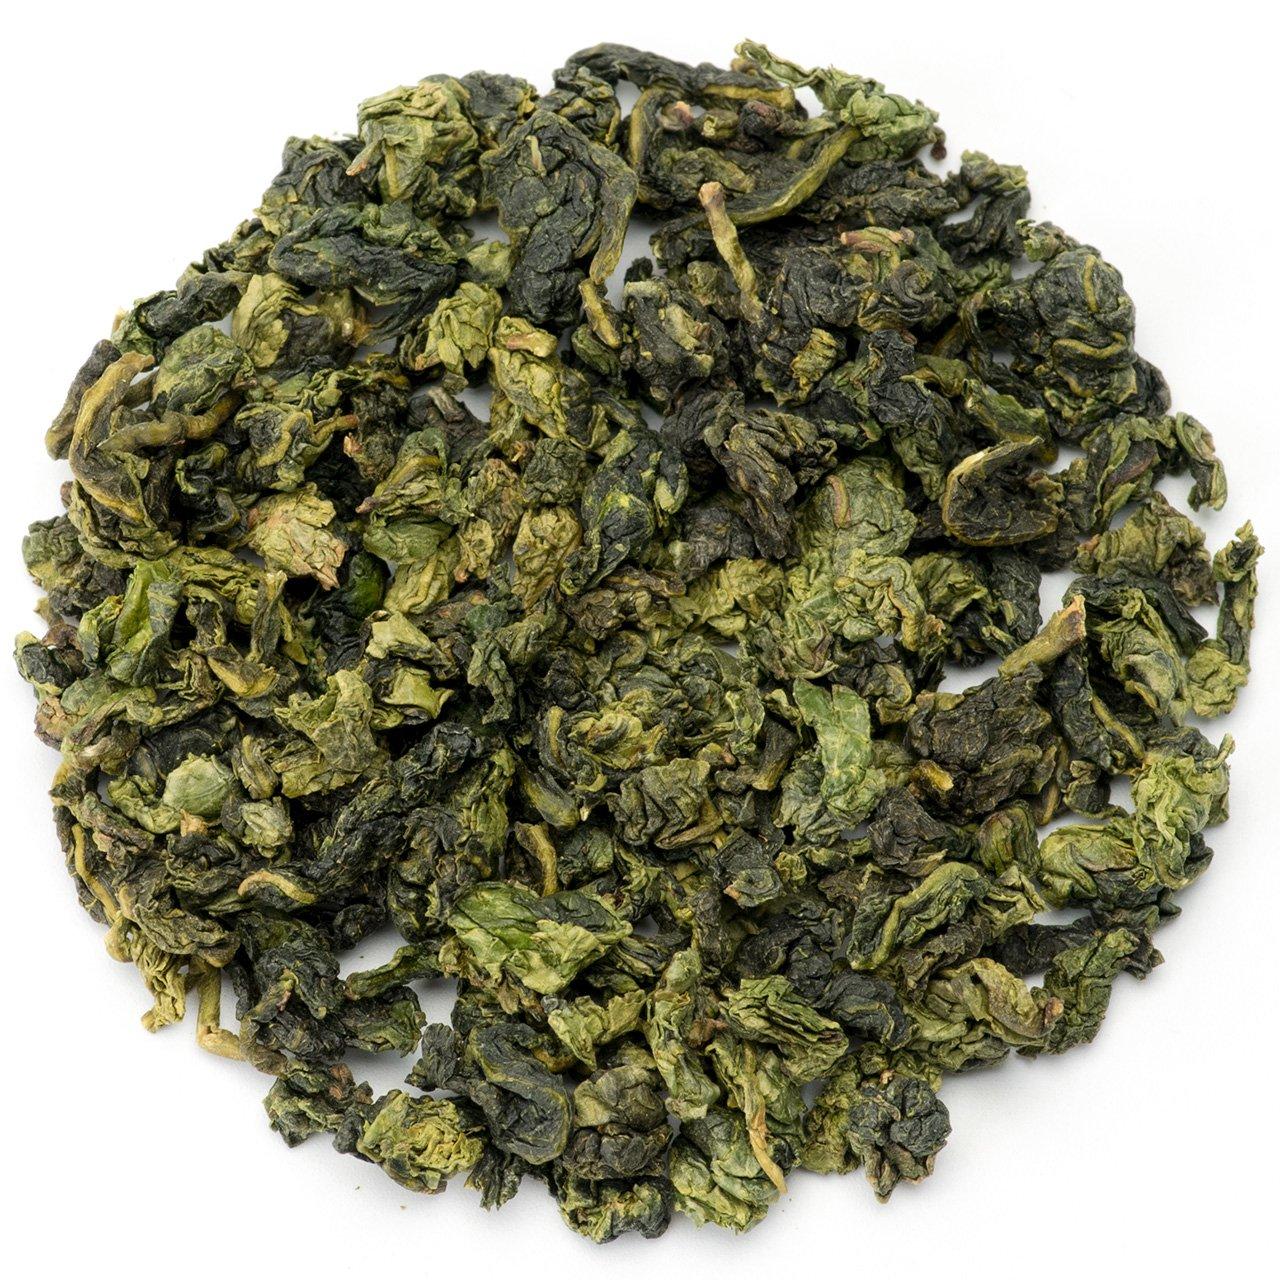 Teavivre Anxi Tie Guan Yin Oolong Tea, Iron Goddess of Mercy, Loose Leaf Chinese Tea - 7oz / 200g